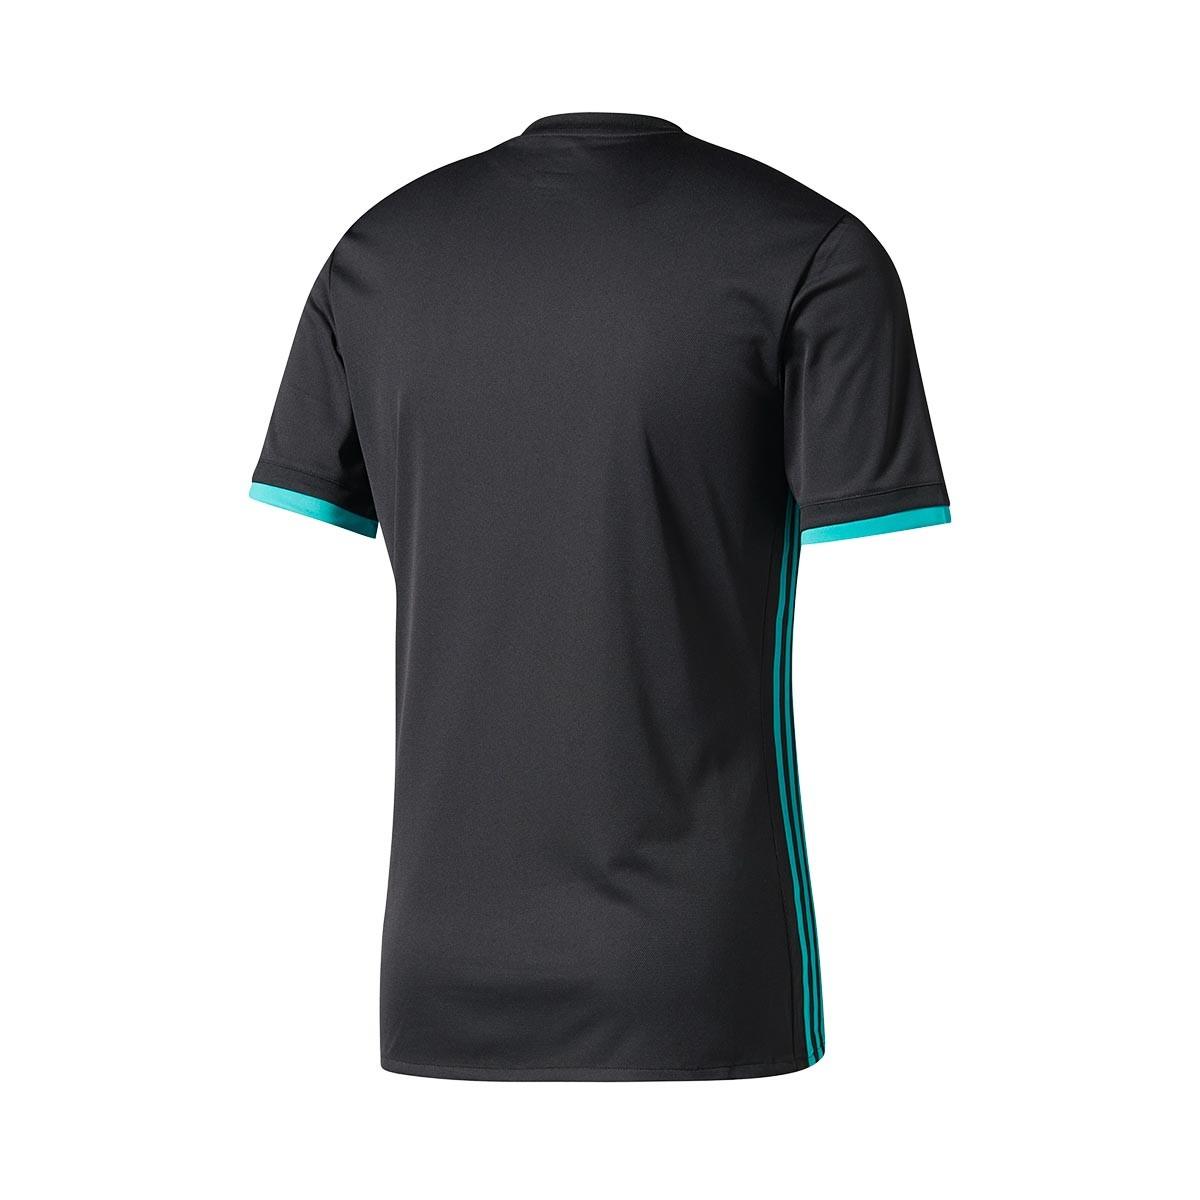 ... Camiseta Real Madrid Segunda Equipación 2017-2018 Black-Aero reef.  CATEGORÍA d5ebf0f4eea2e